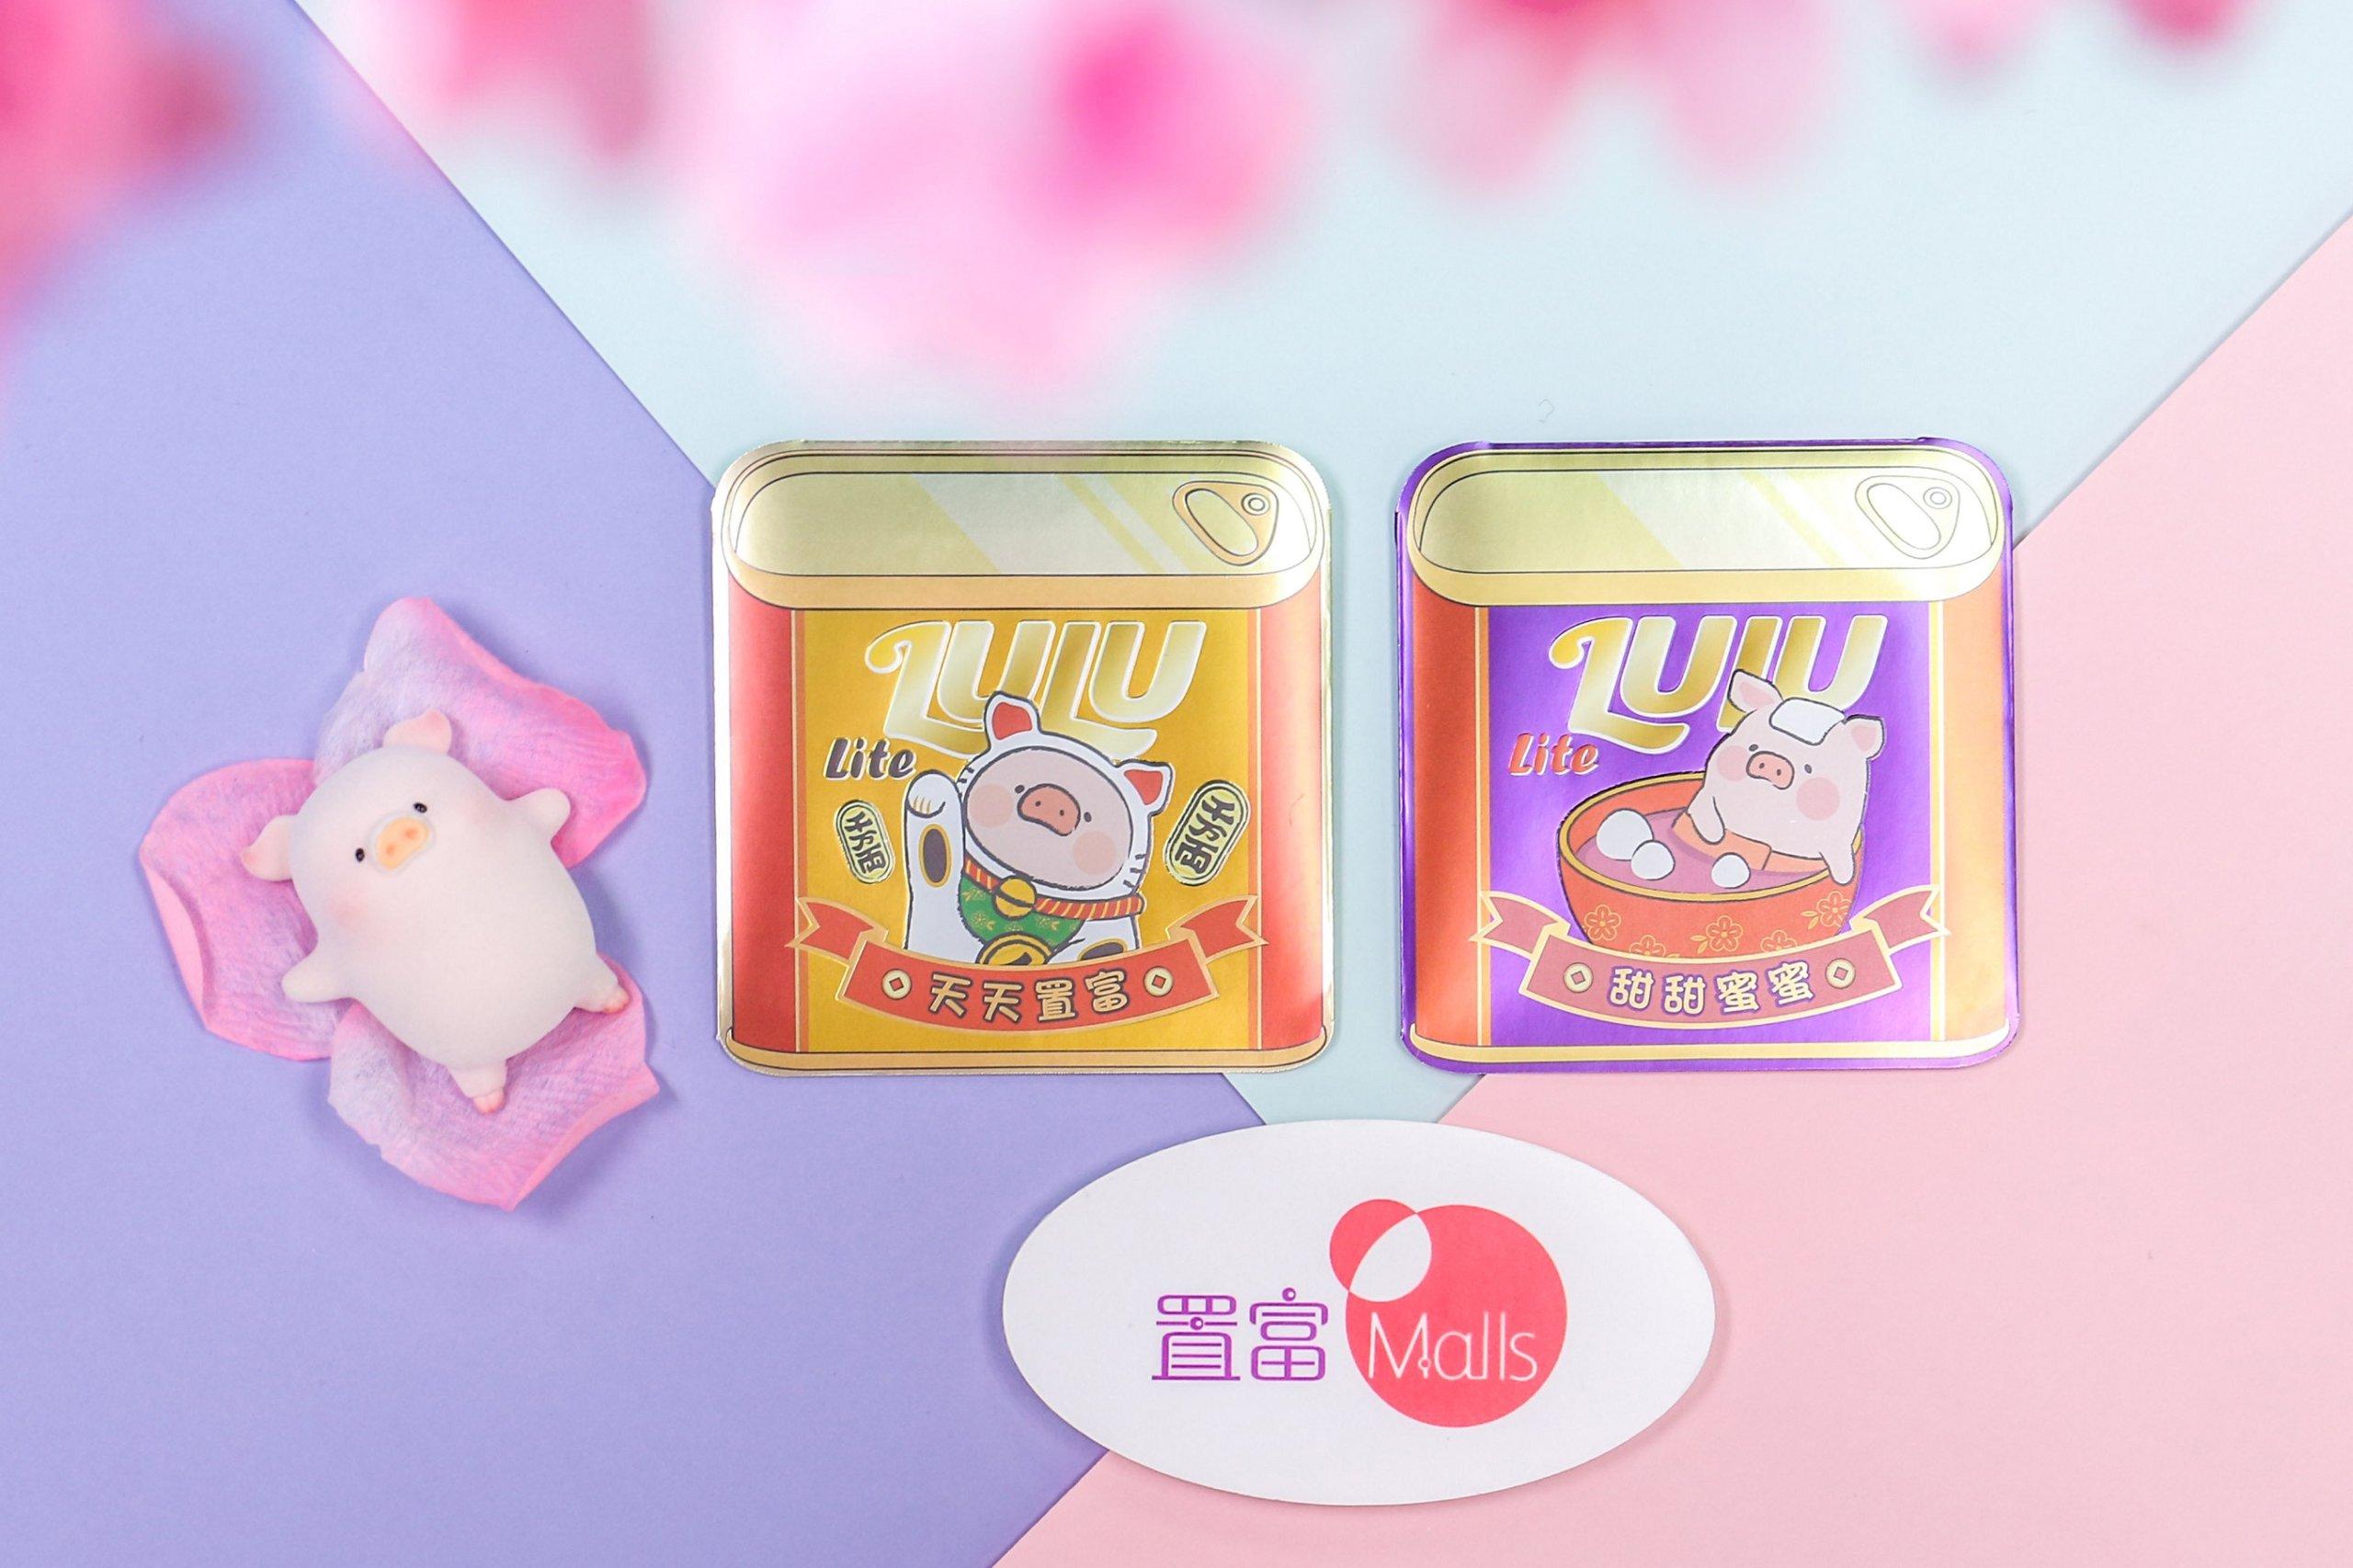 「Lulu 豬放閃餐肉罐利是封」以金屬效果營造餐肉罐效果,Lulu 豬Cosplay 象徵財運嘅招財貓,祝願各位天天置富;另一款則是泡在紅豆年糕湯中,寓意甜甜蜜蜜。